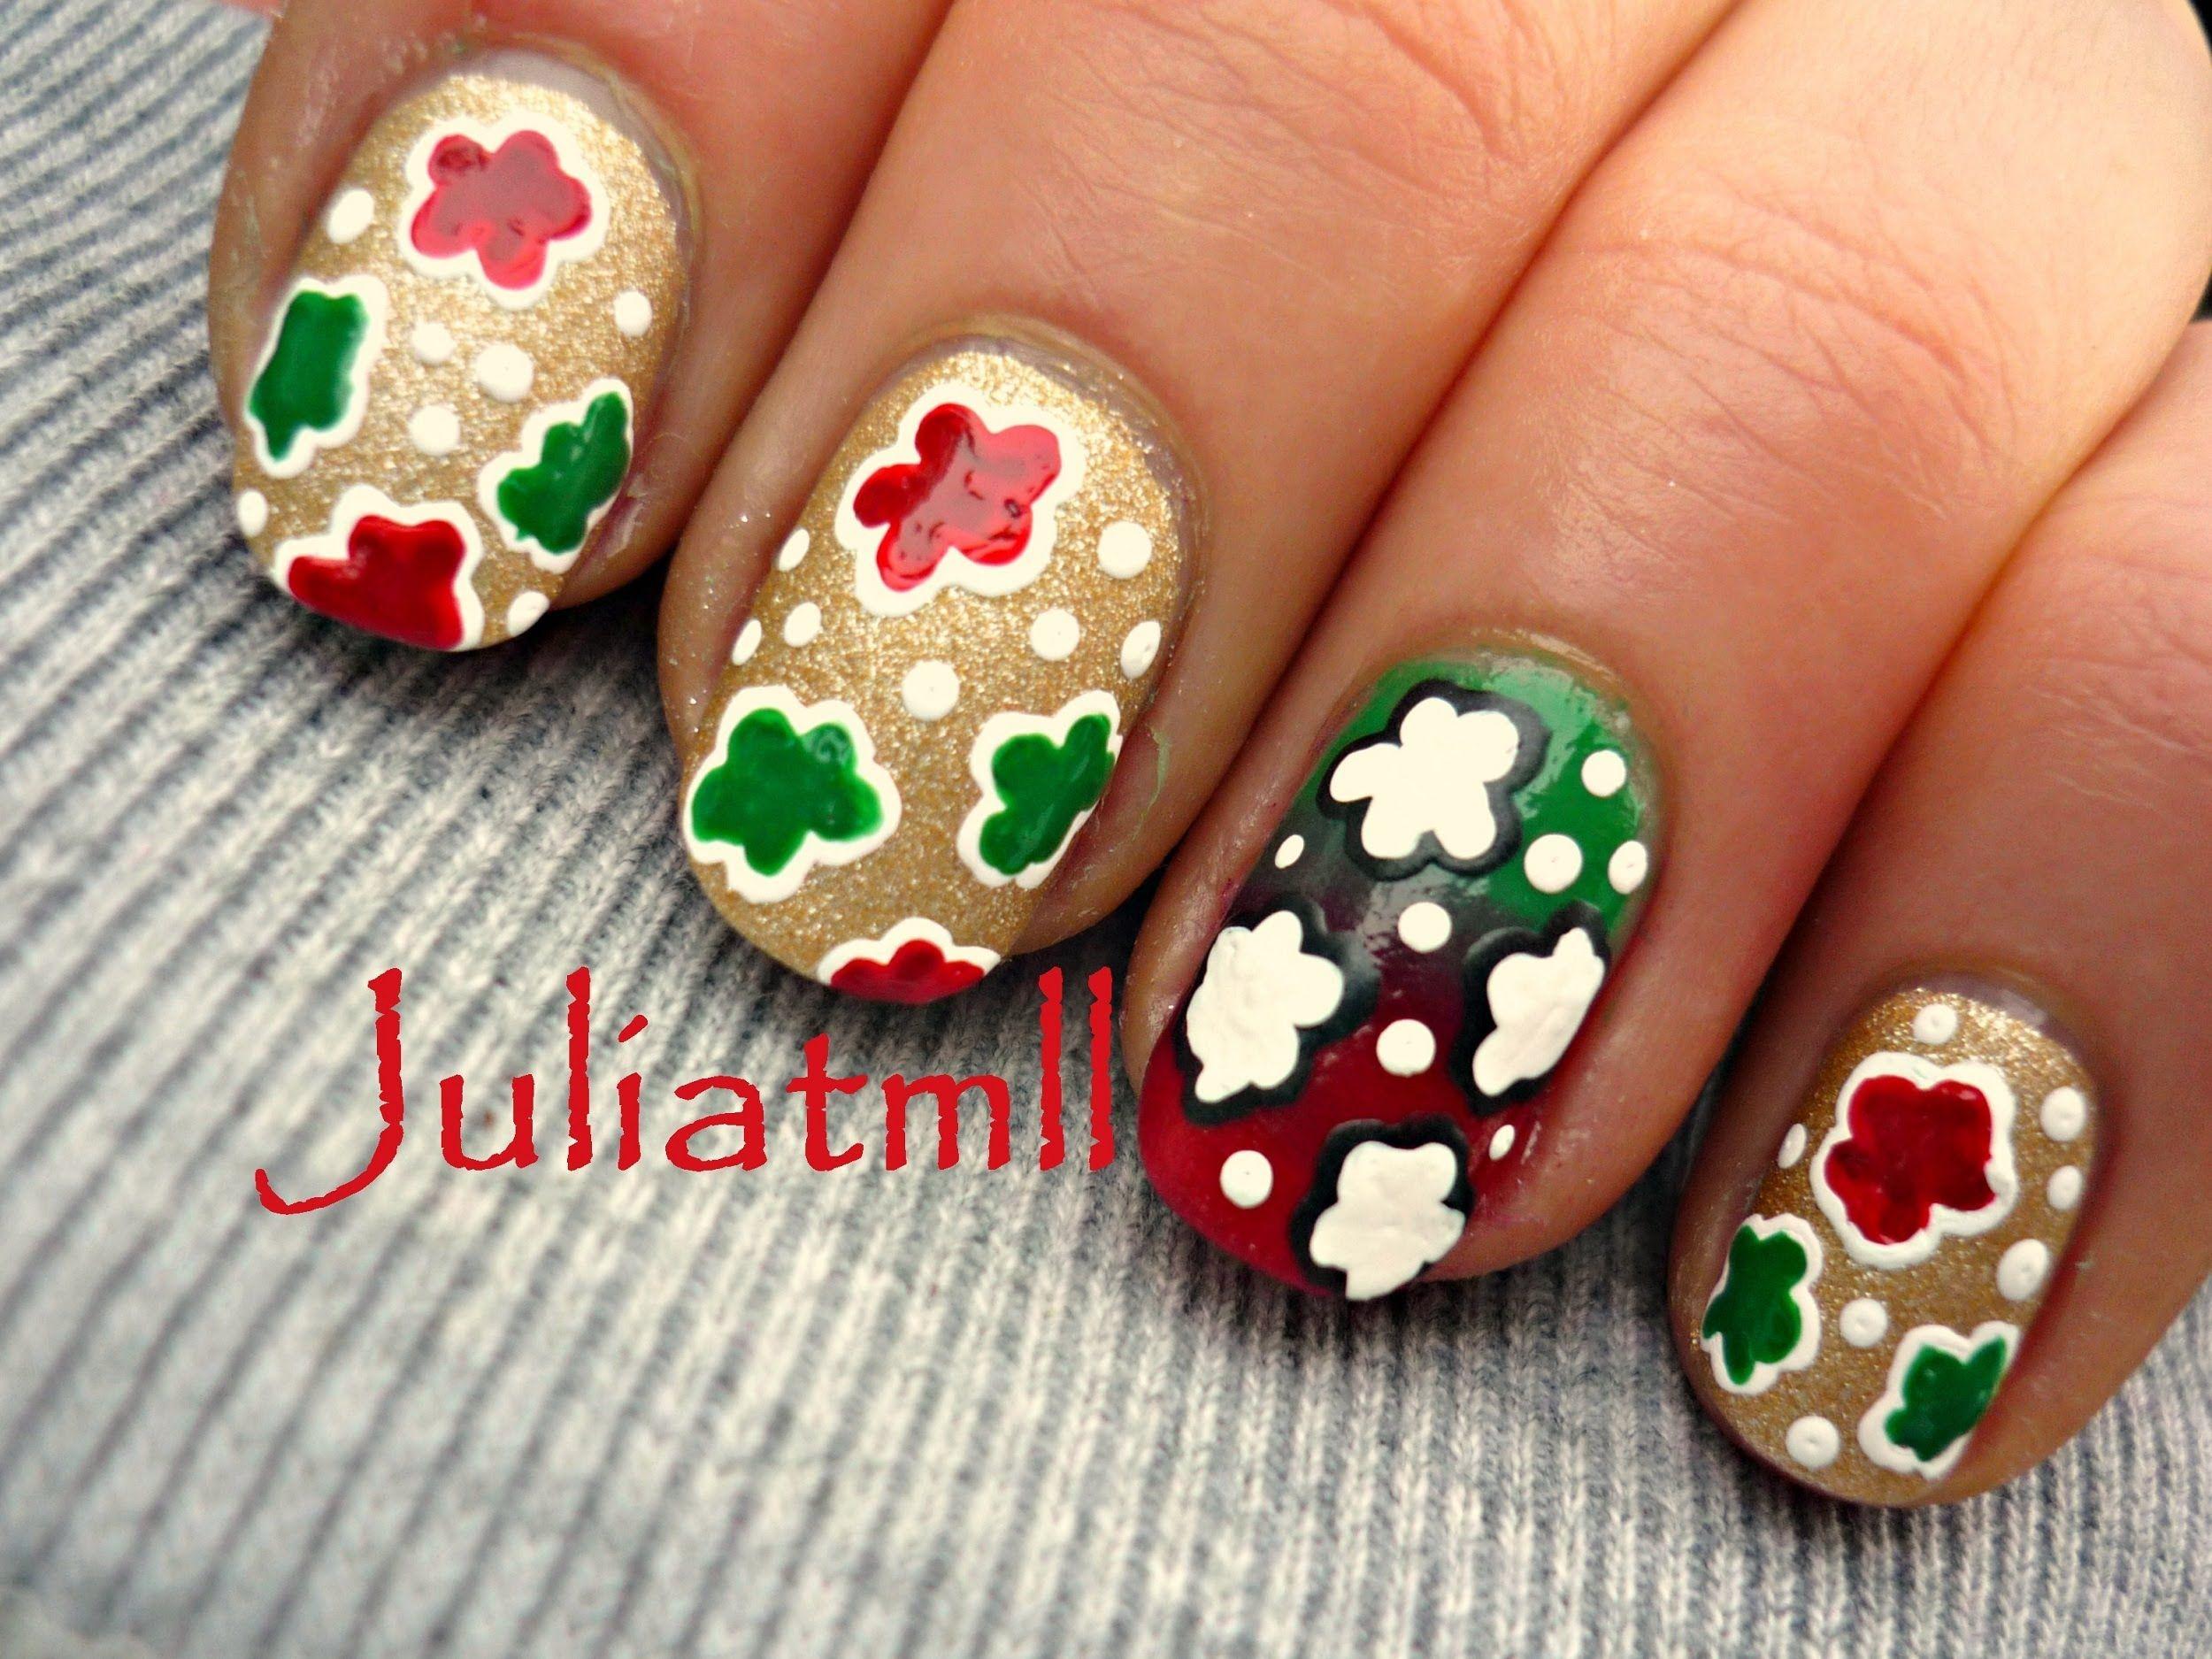 Christmas Nail Art Tutorial Opi Gwen Stefani Collection Nails I